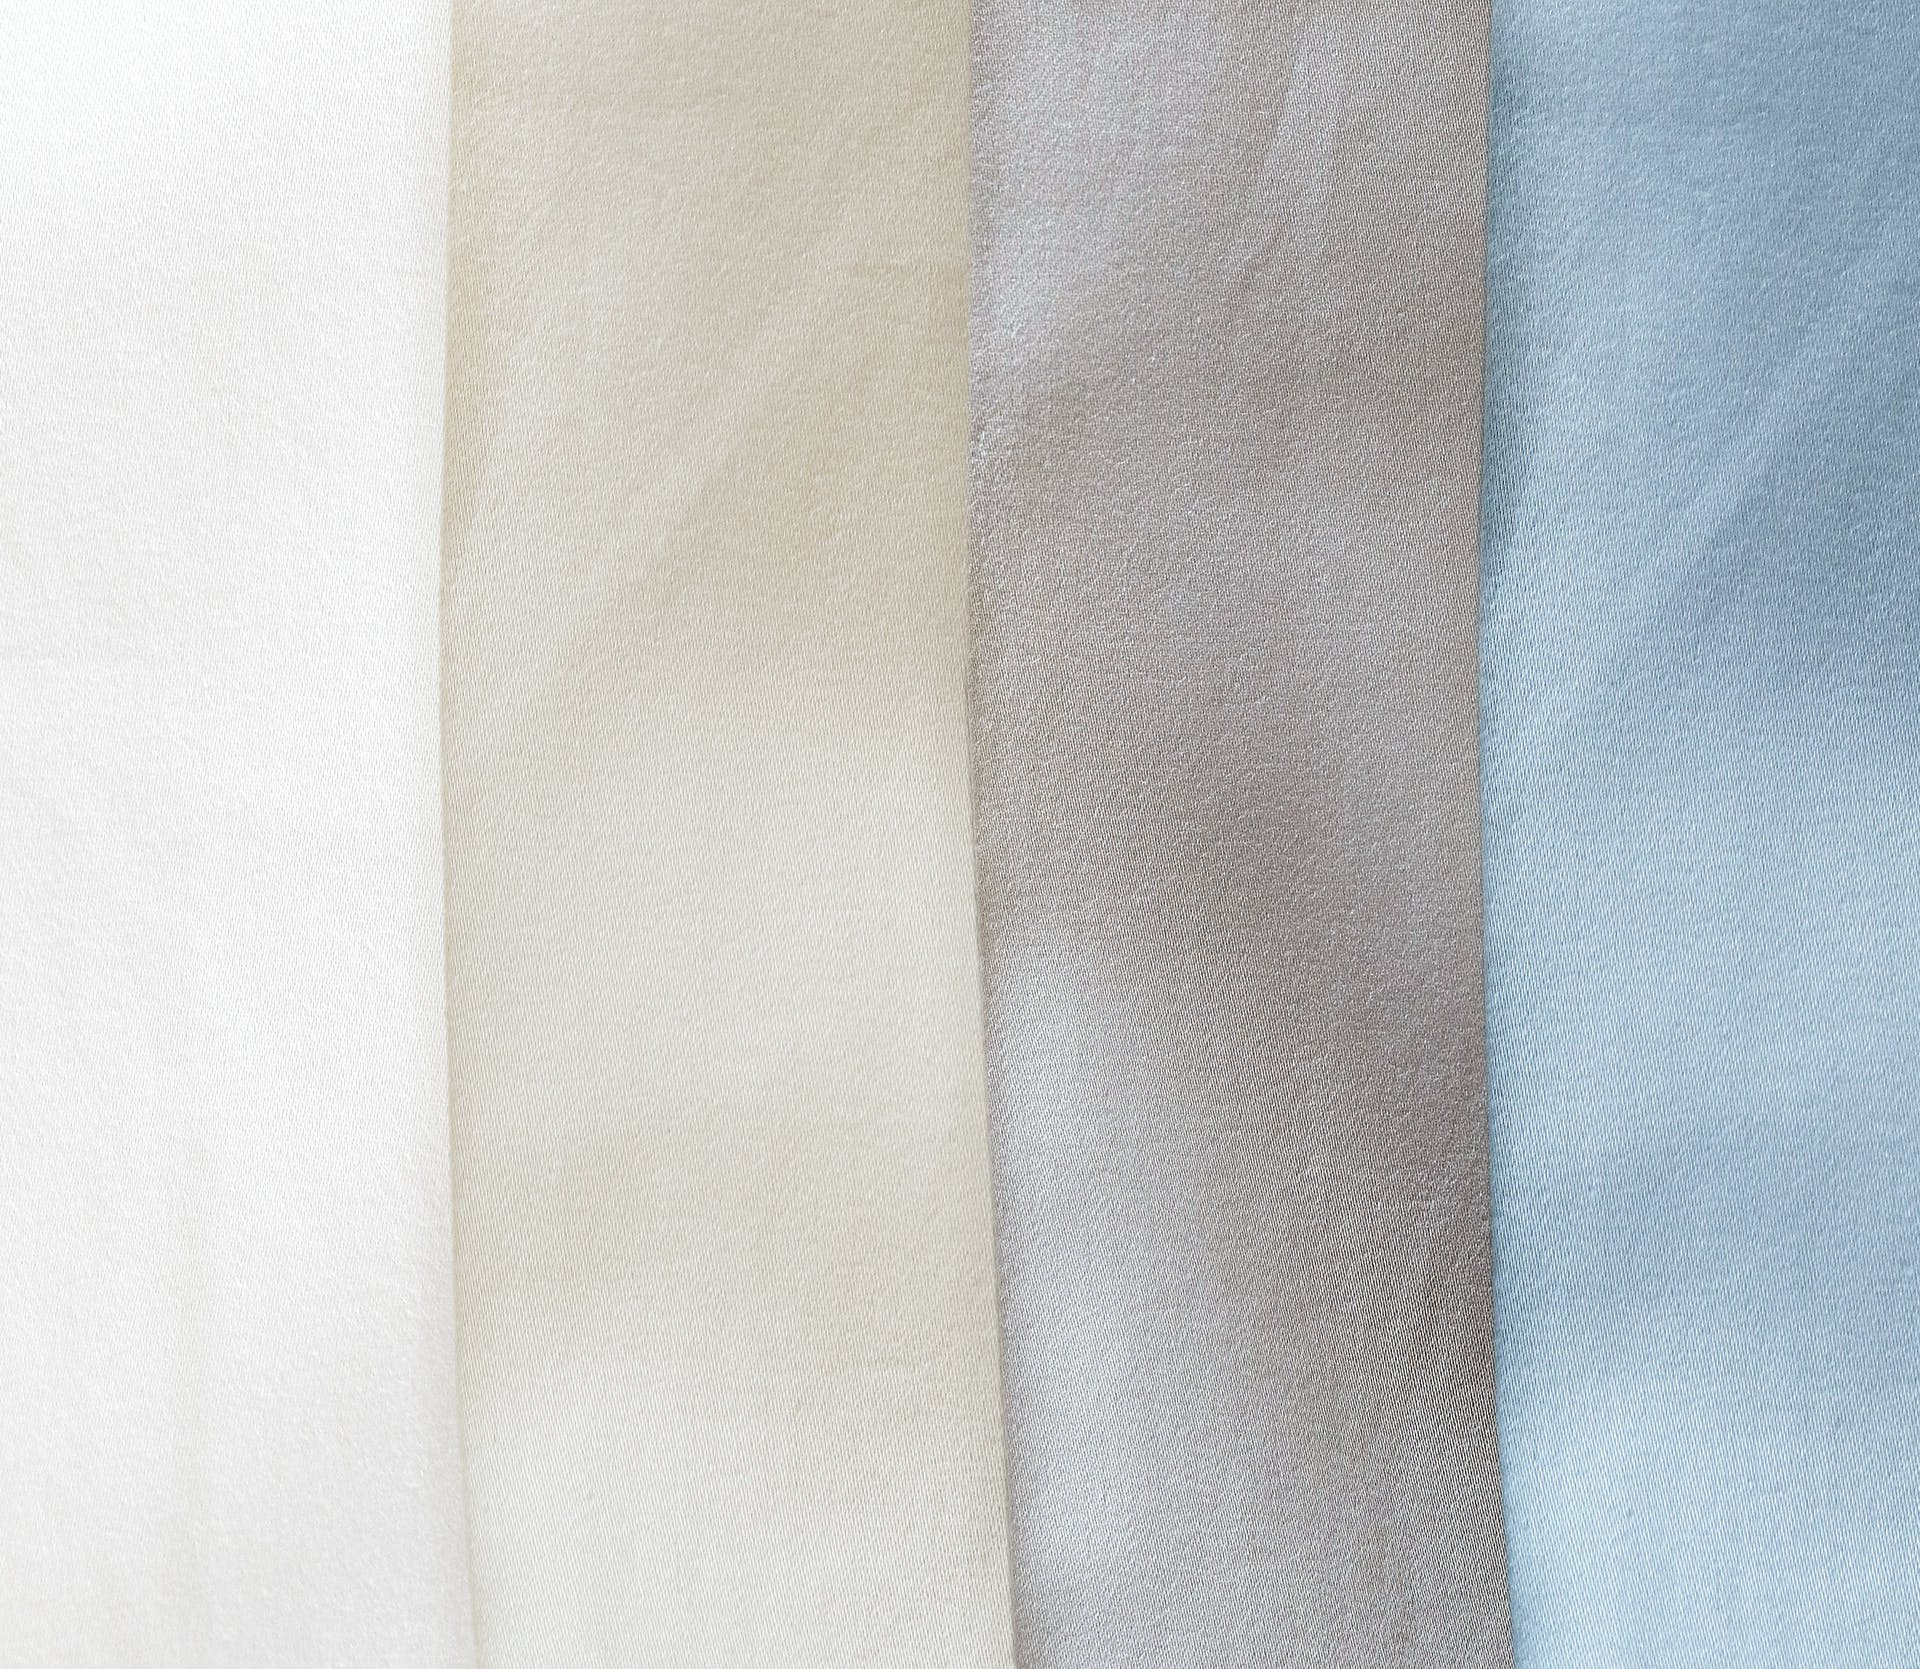 are the leesa sheets comfortable?